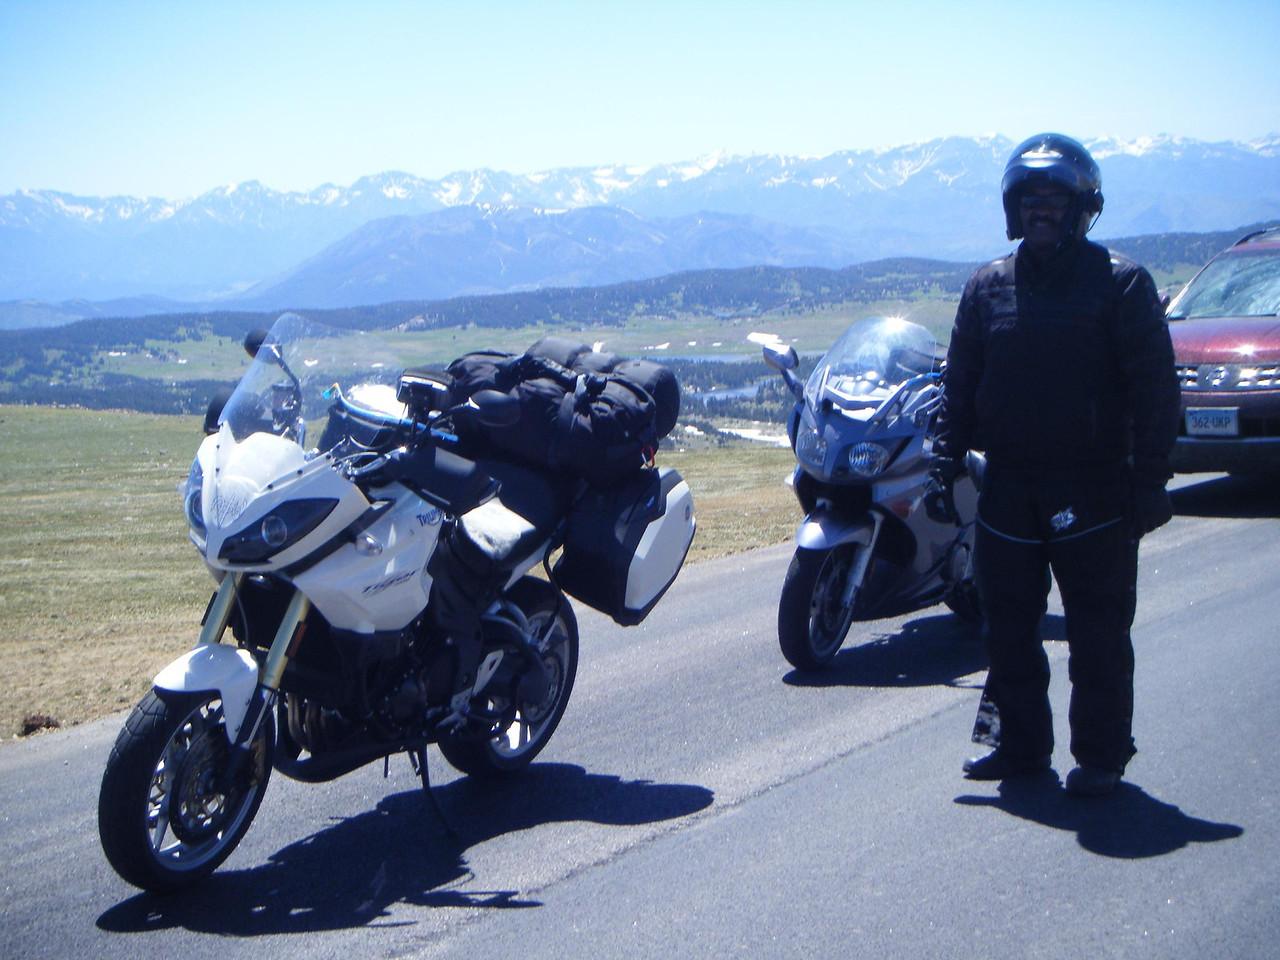 Beartooth Hwy  212 Mt/Wy traffic wait for road work